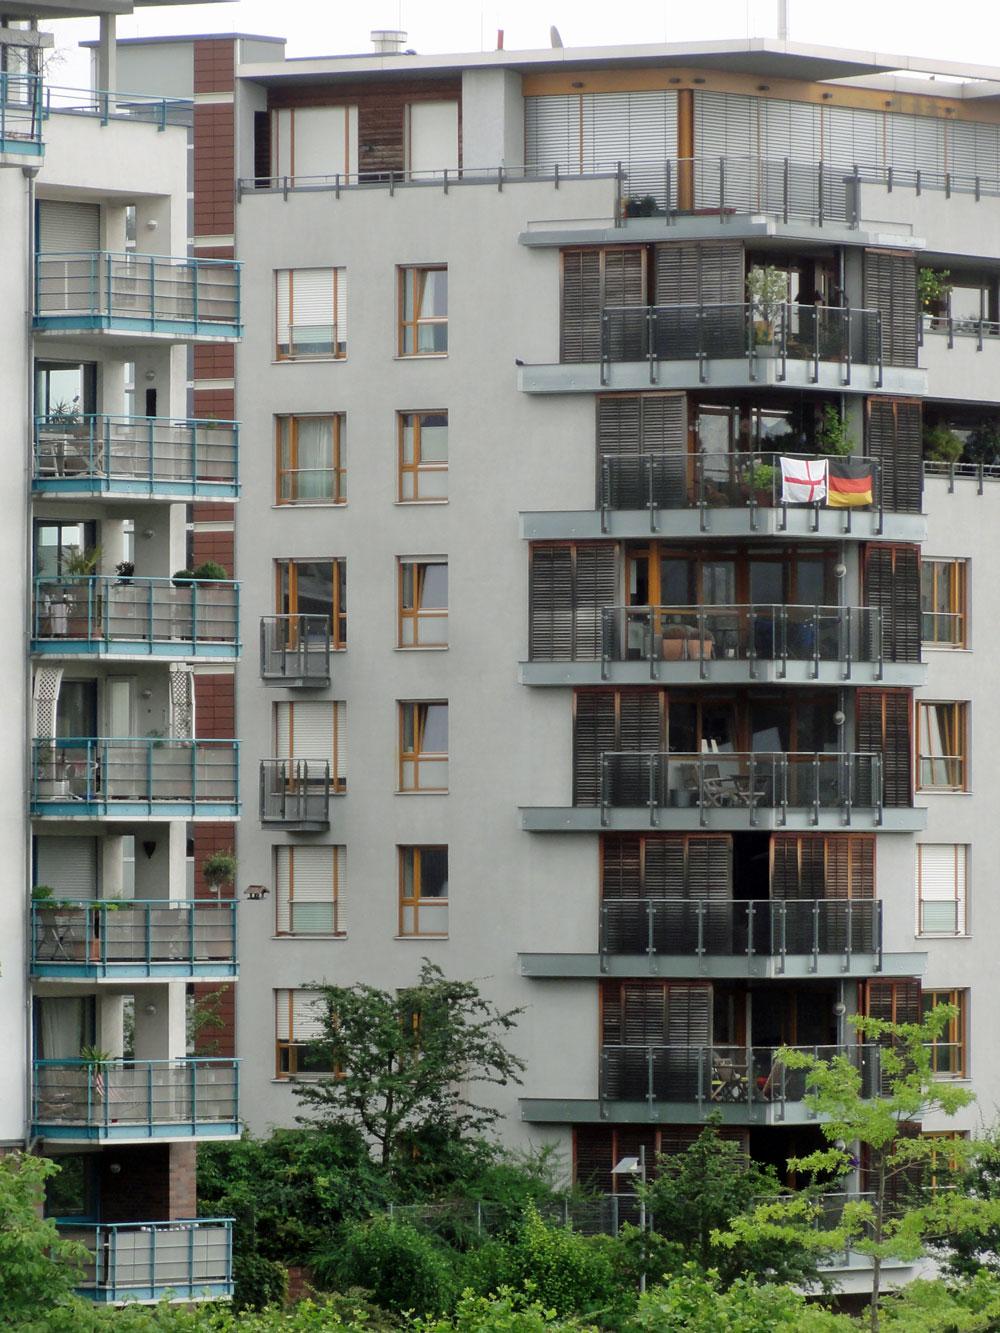 Englandfahne zur EURO 2106 in Frankfurt